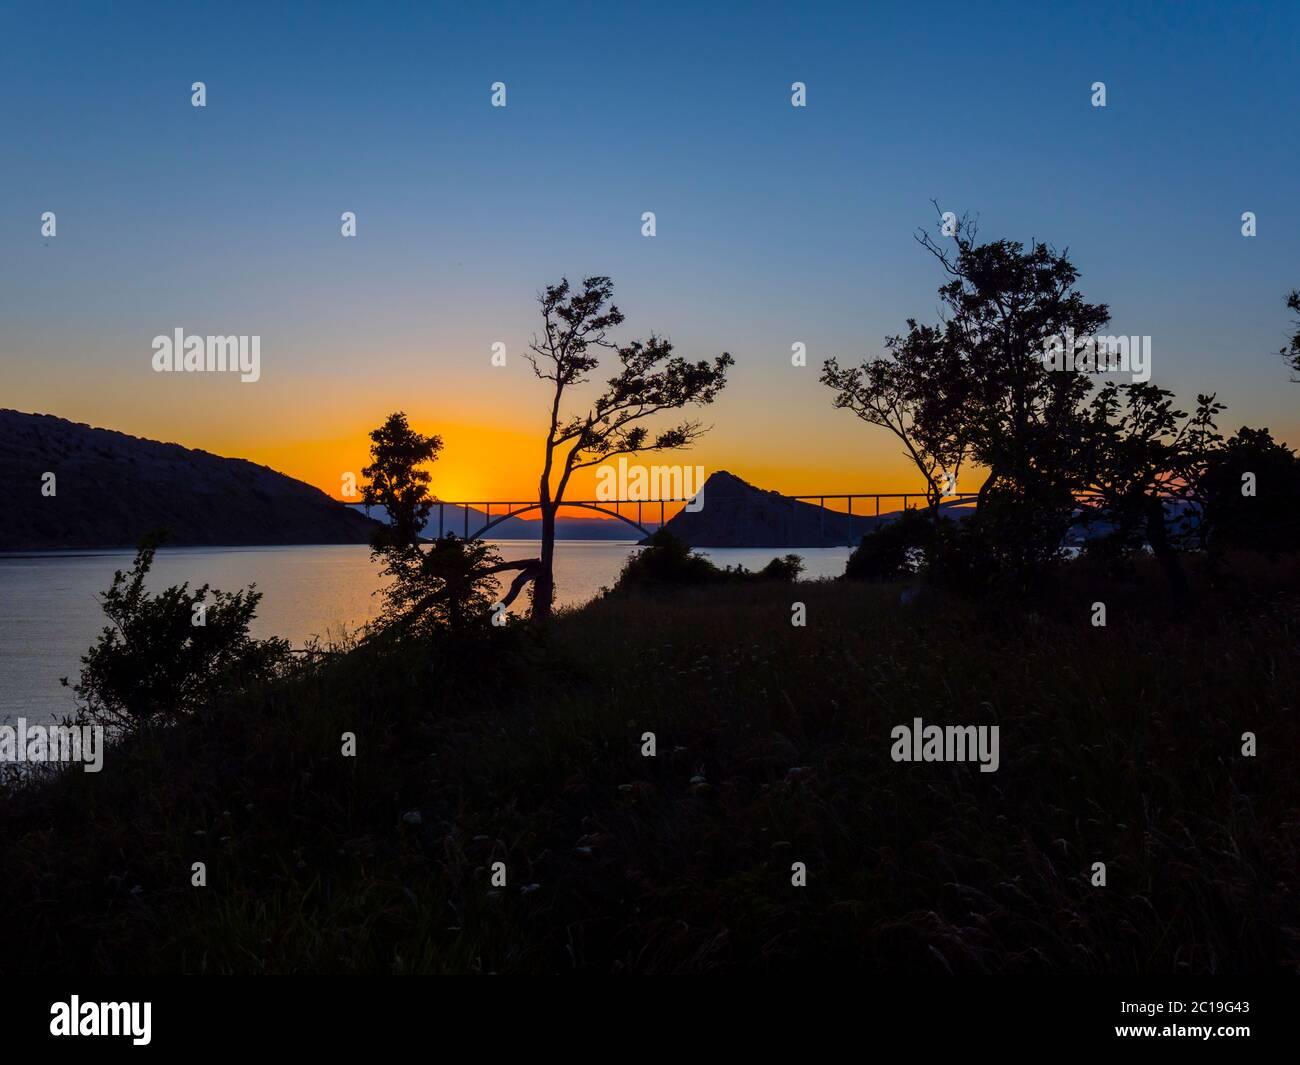 Sunset landscape silhouette silhouetting trees bridge mainland to island Krk Croatia Stock Photo